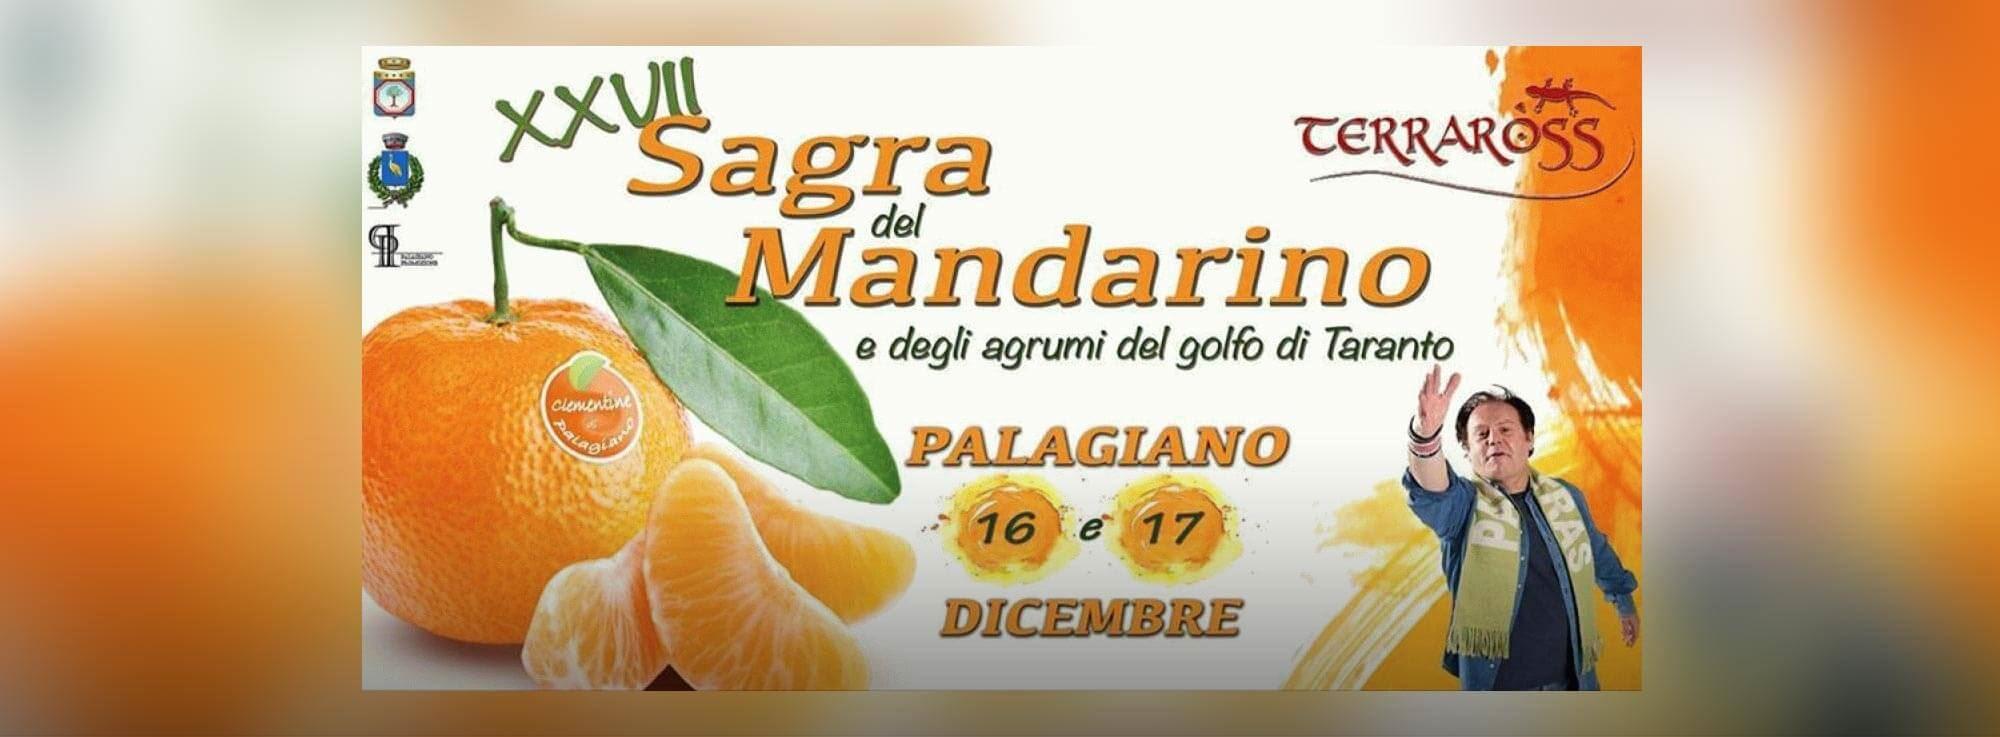 Palagiano: Sagra del Mandarino